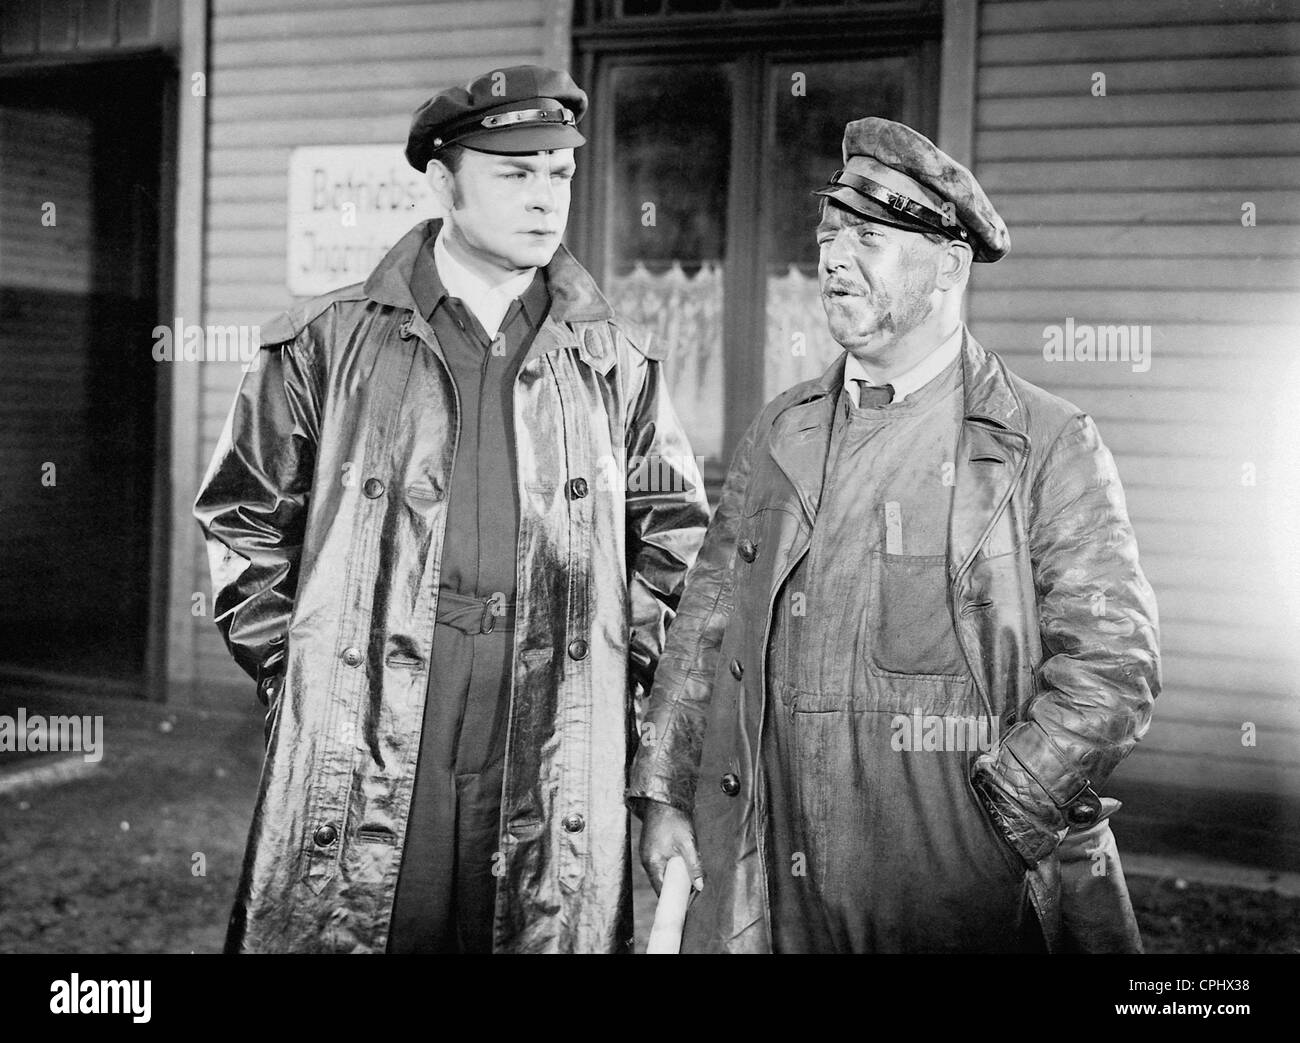 Paul Hartmann und Hermann Speelmans in 'F.P.1 doesn't answer', 1932 - Stock Image